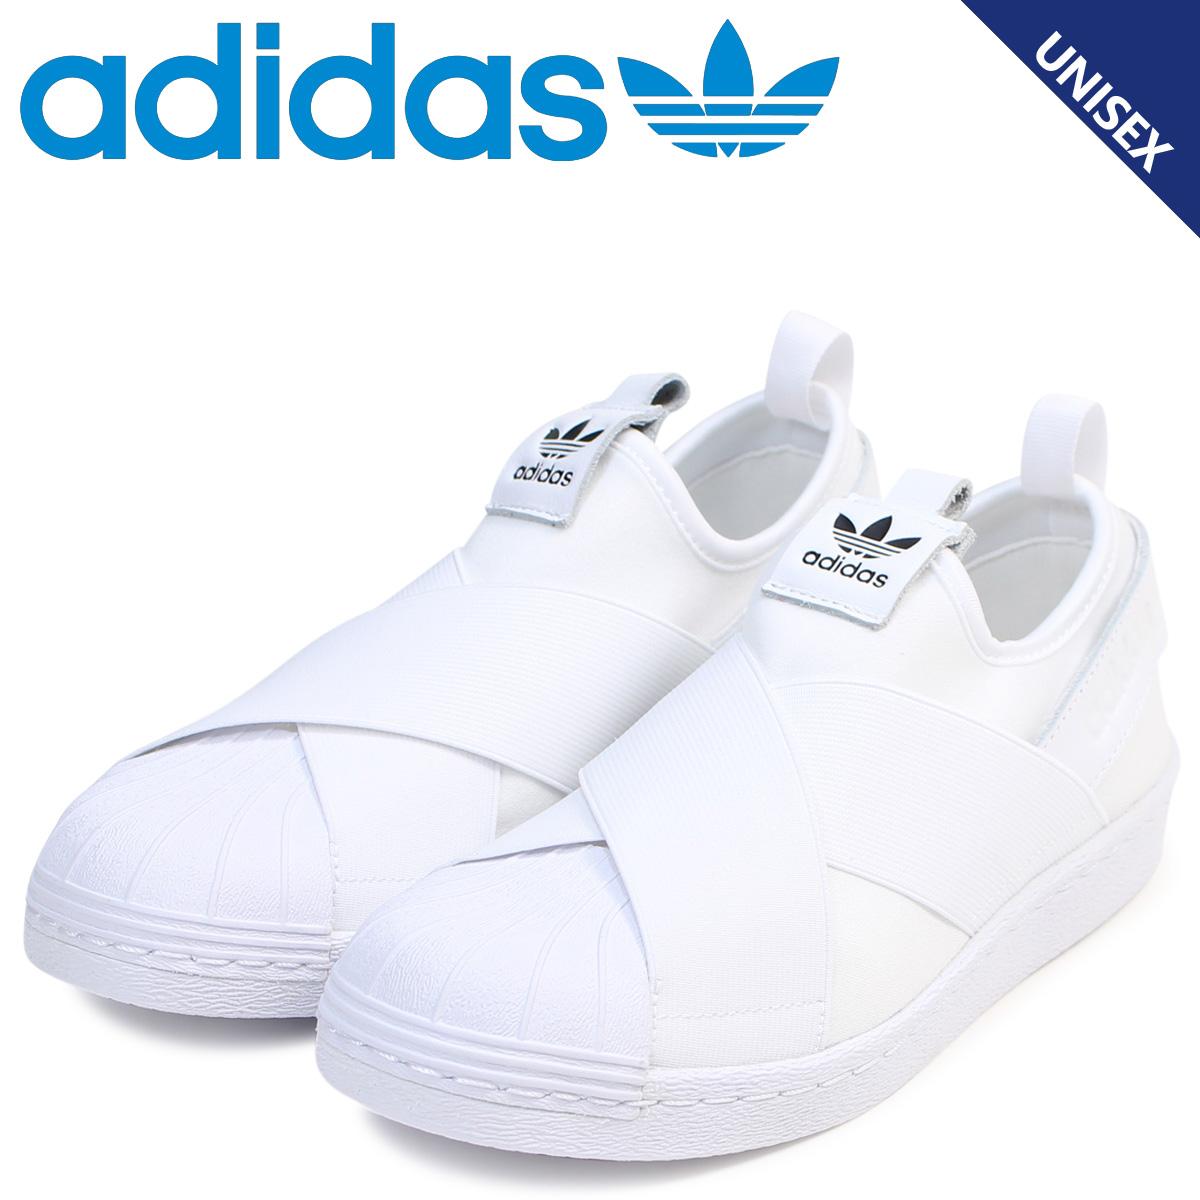 adidas Originals Adidas originals superstar slip ons sneakers men gap Dis SUPERSTAR SLIP ON W white white S81338 [the 821 additional arrival]